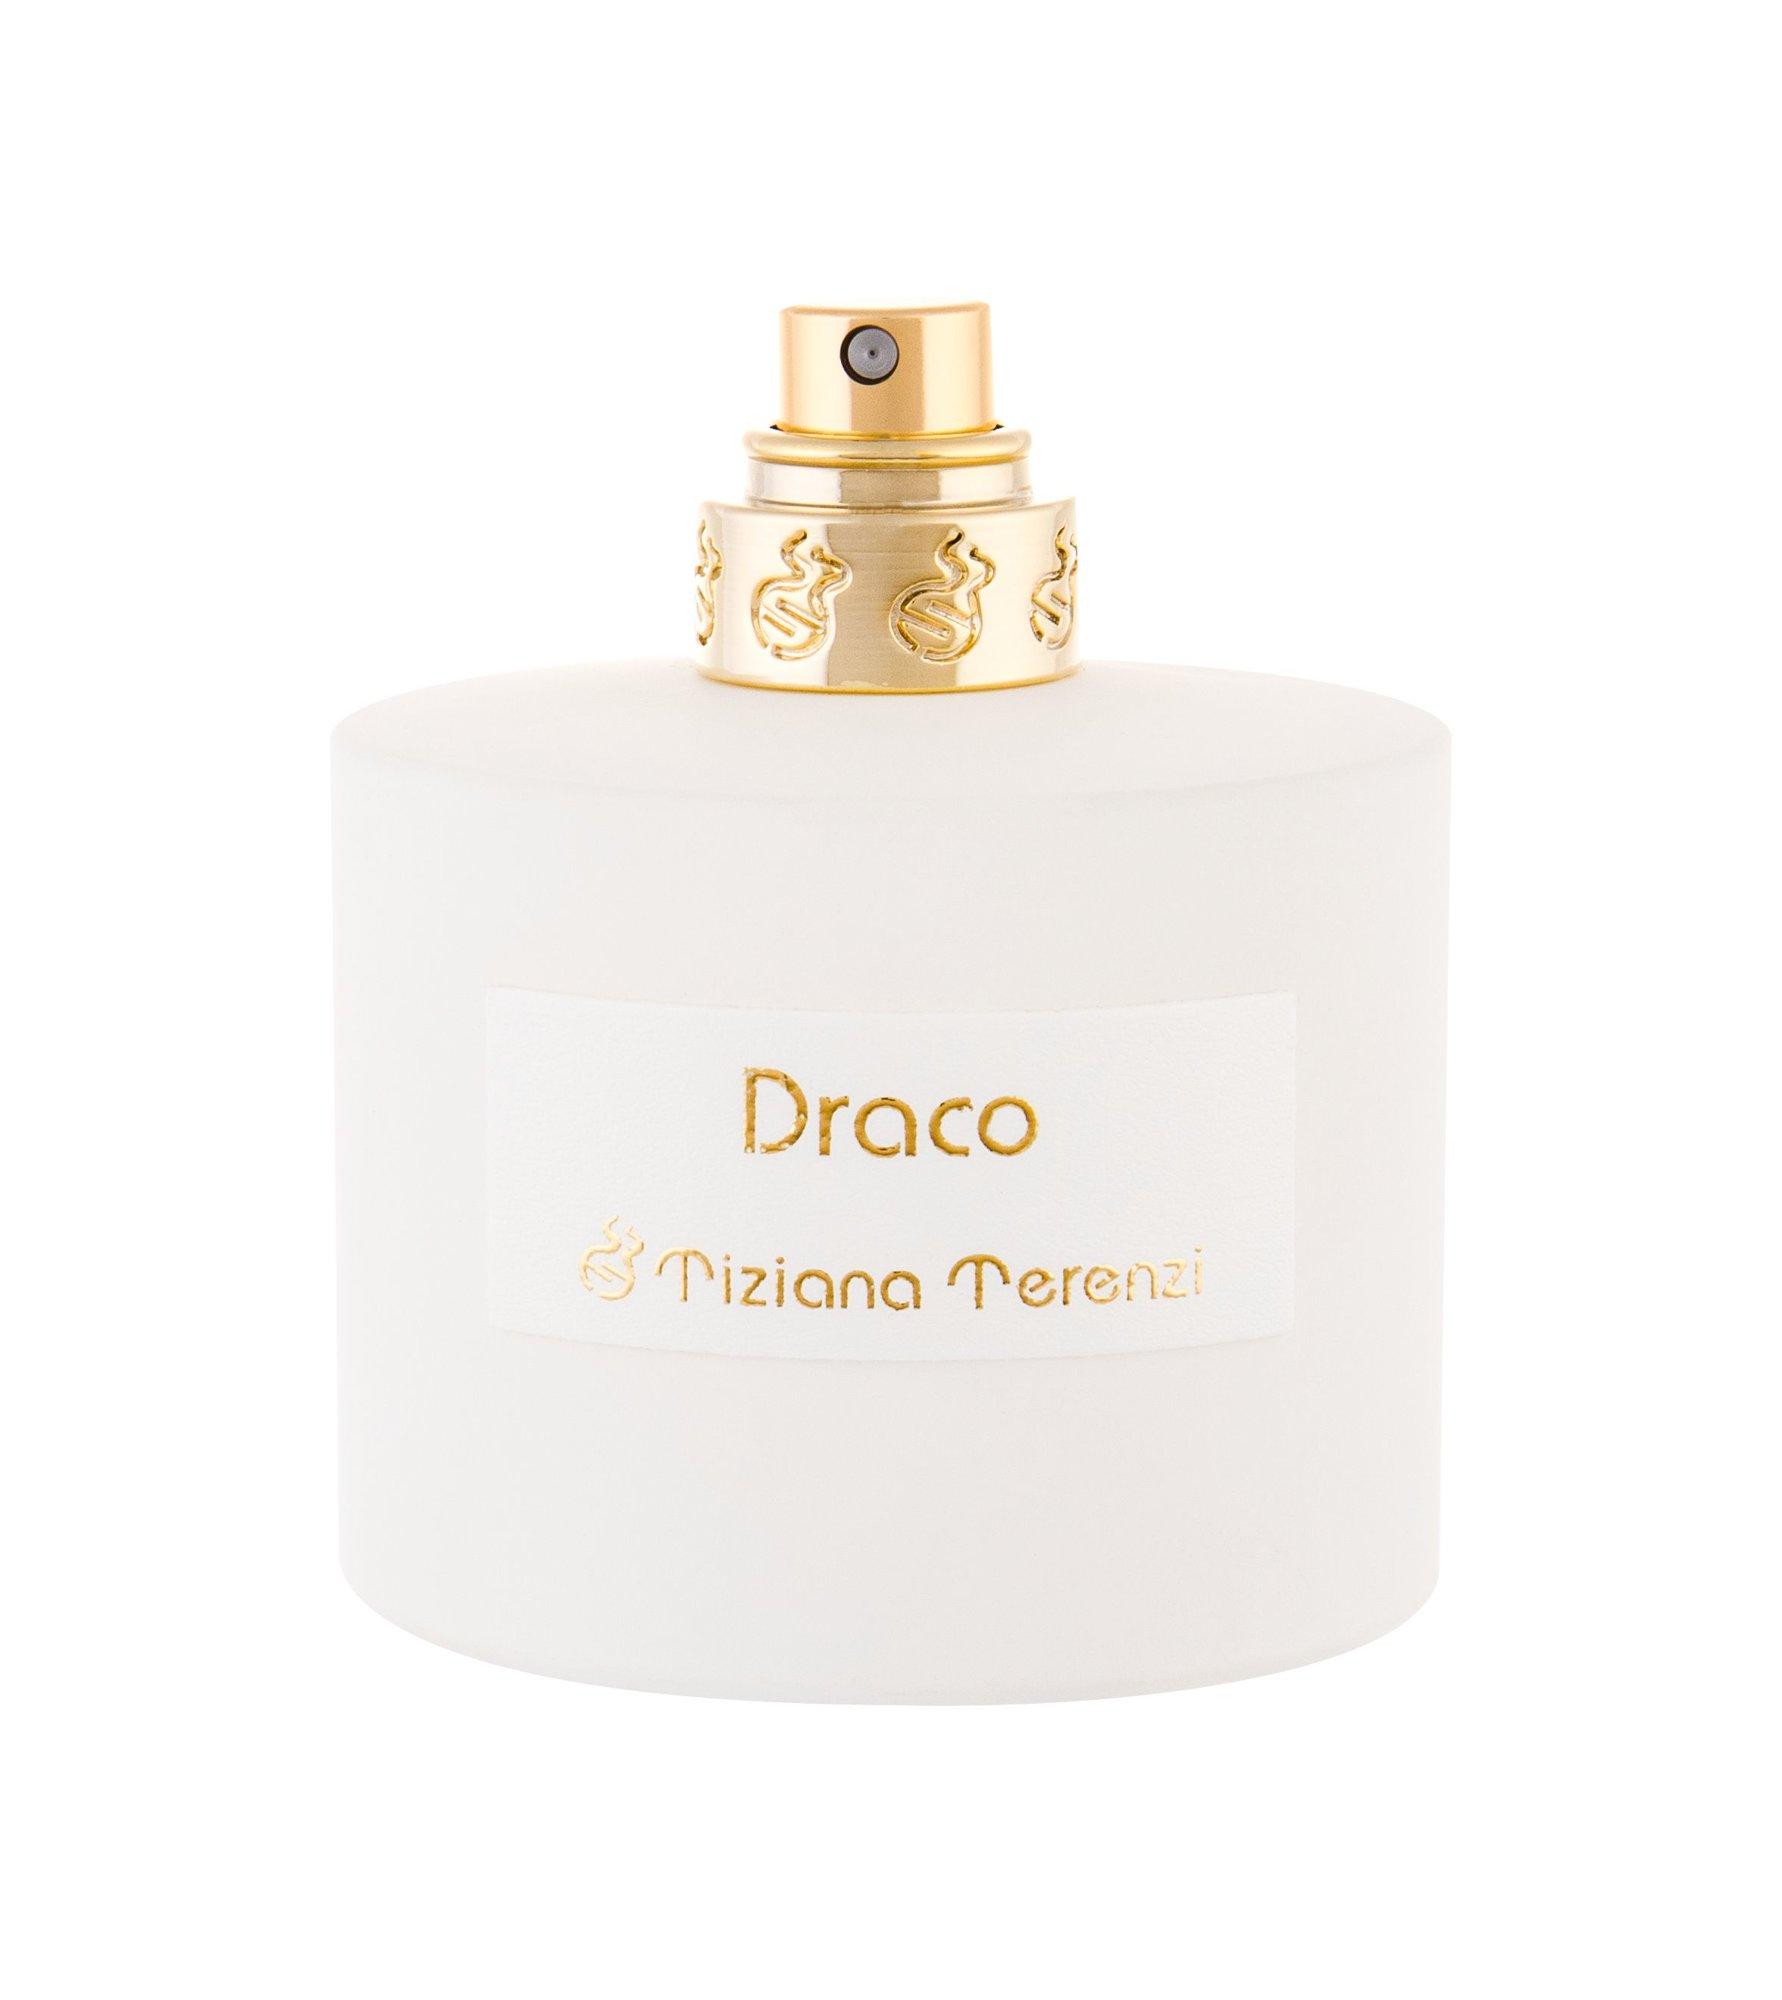 Tiziana Terenzi Luna Collection Draco Perfume 100ml